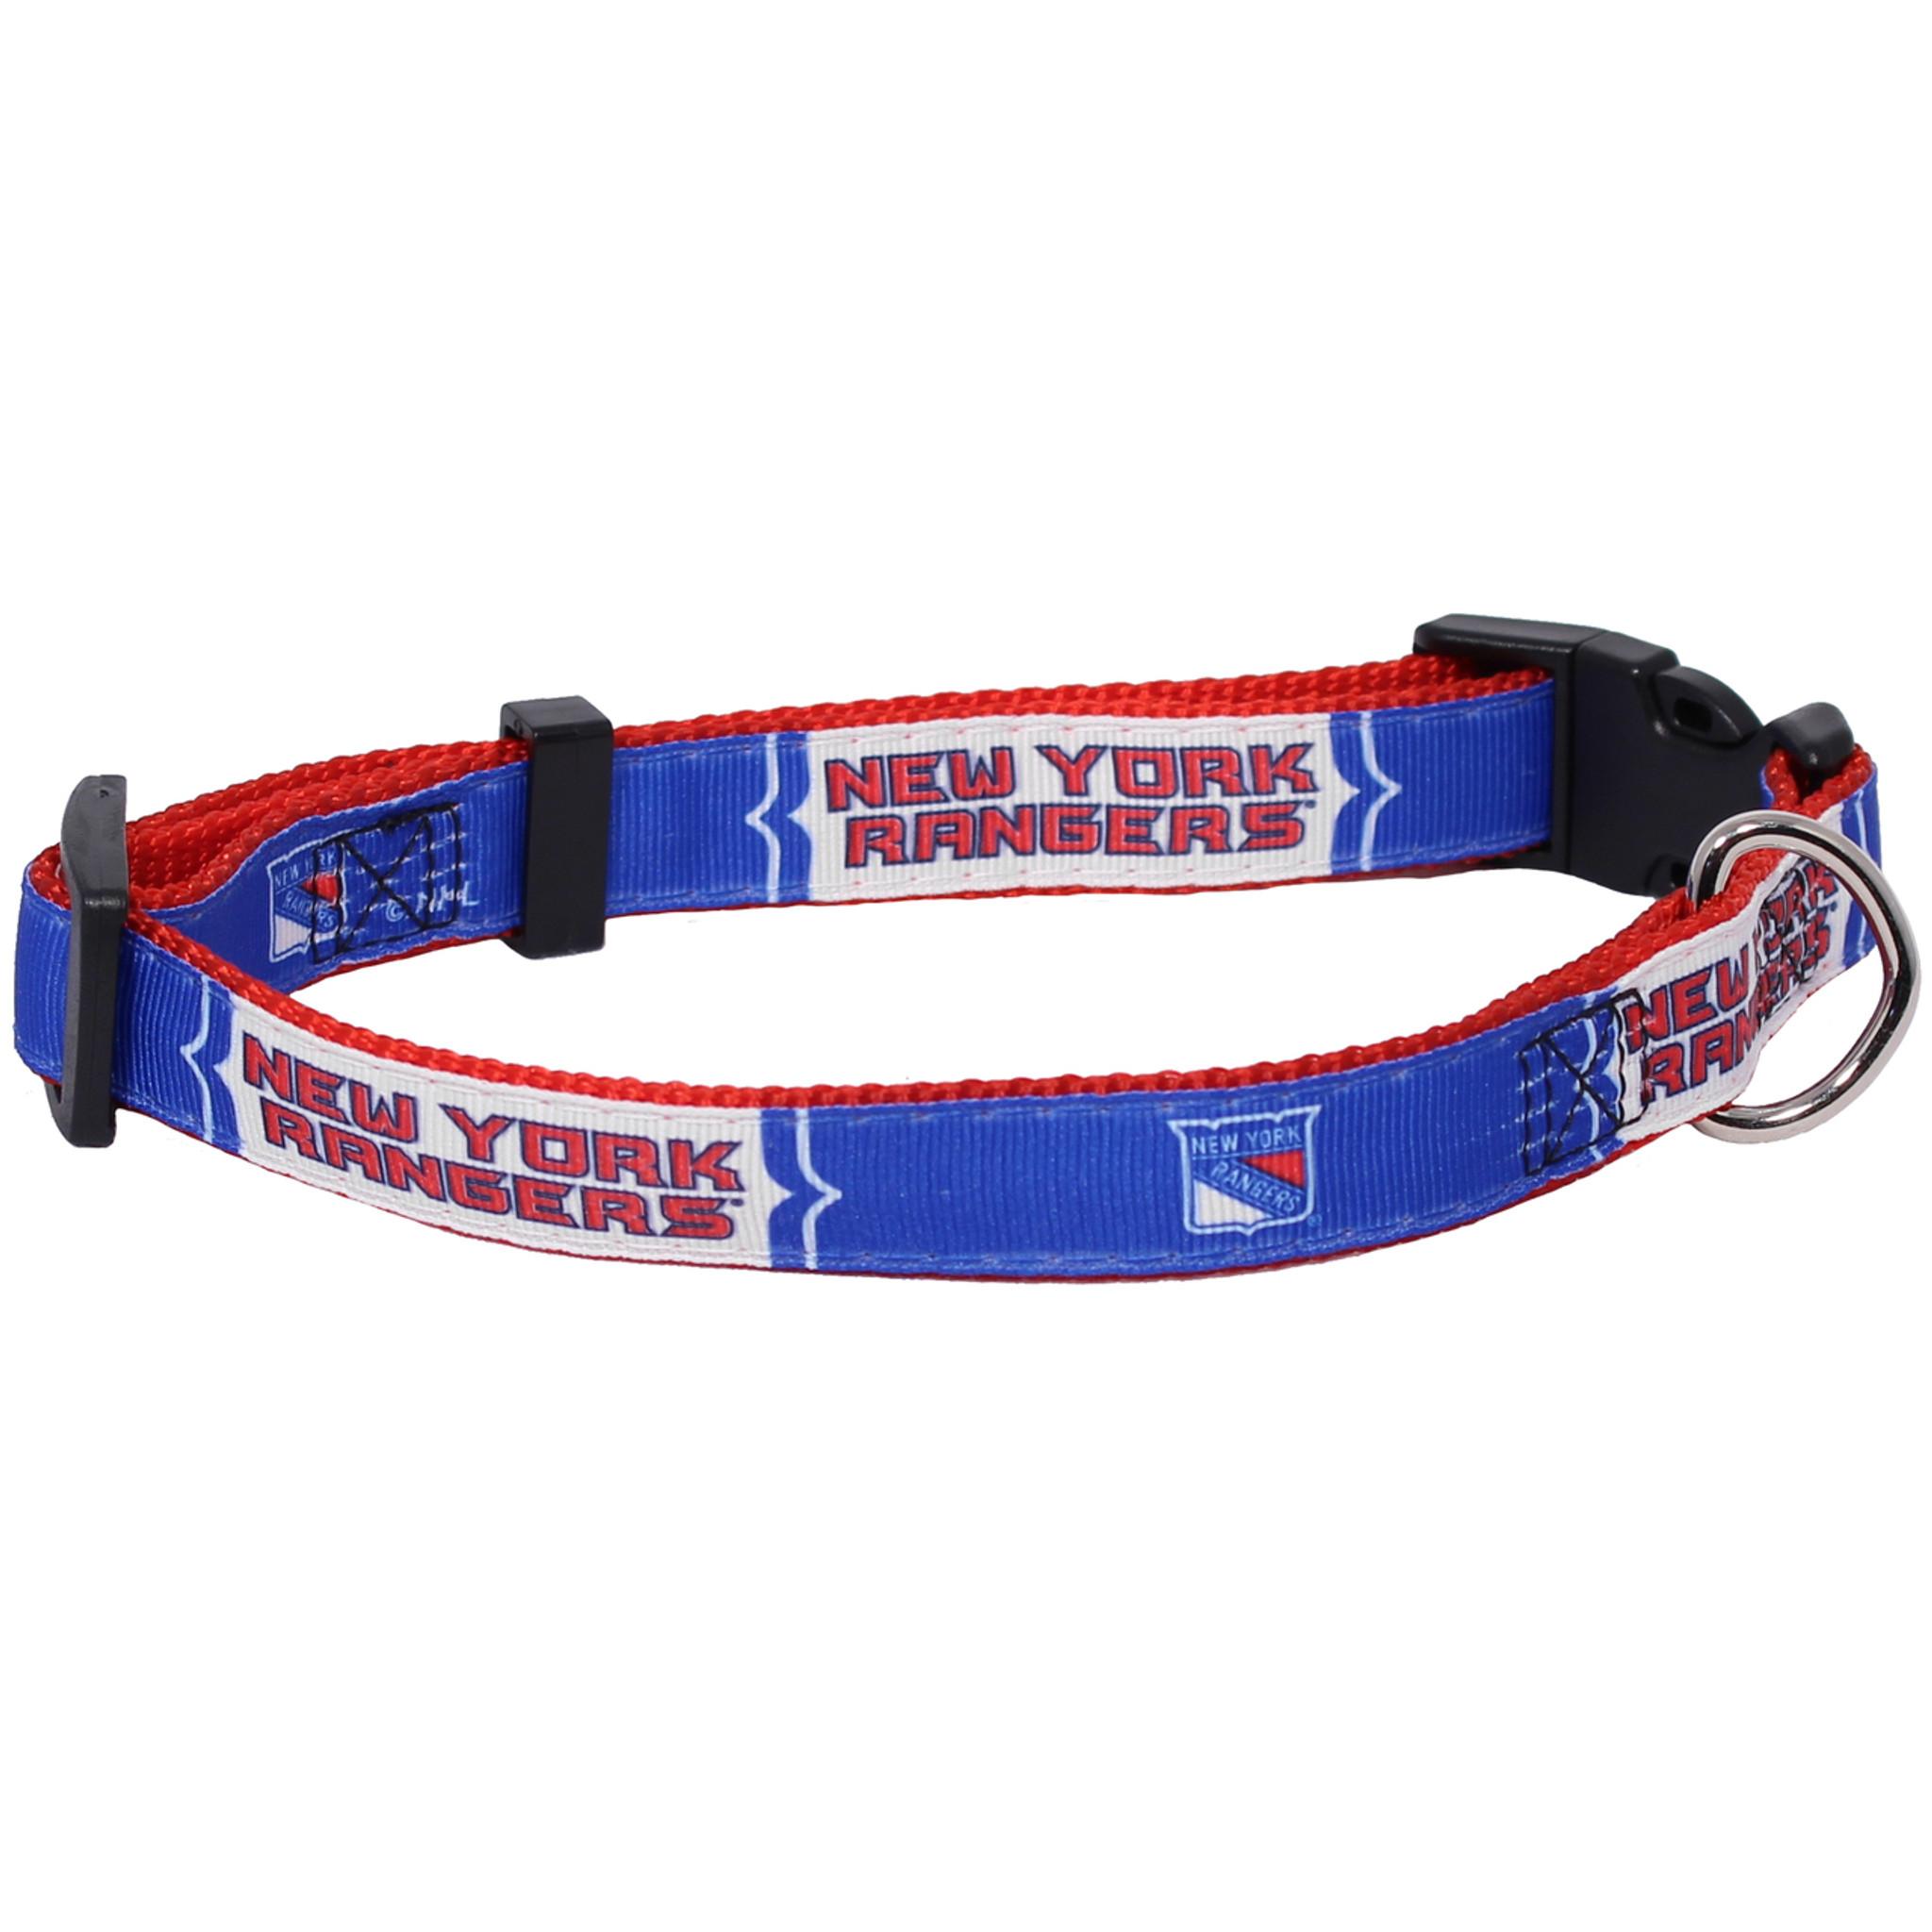 New York Rangers Dog Pet Premium Adjustable Nylon Collar - Spawty c24f97885